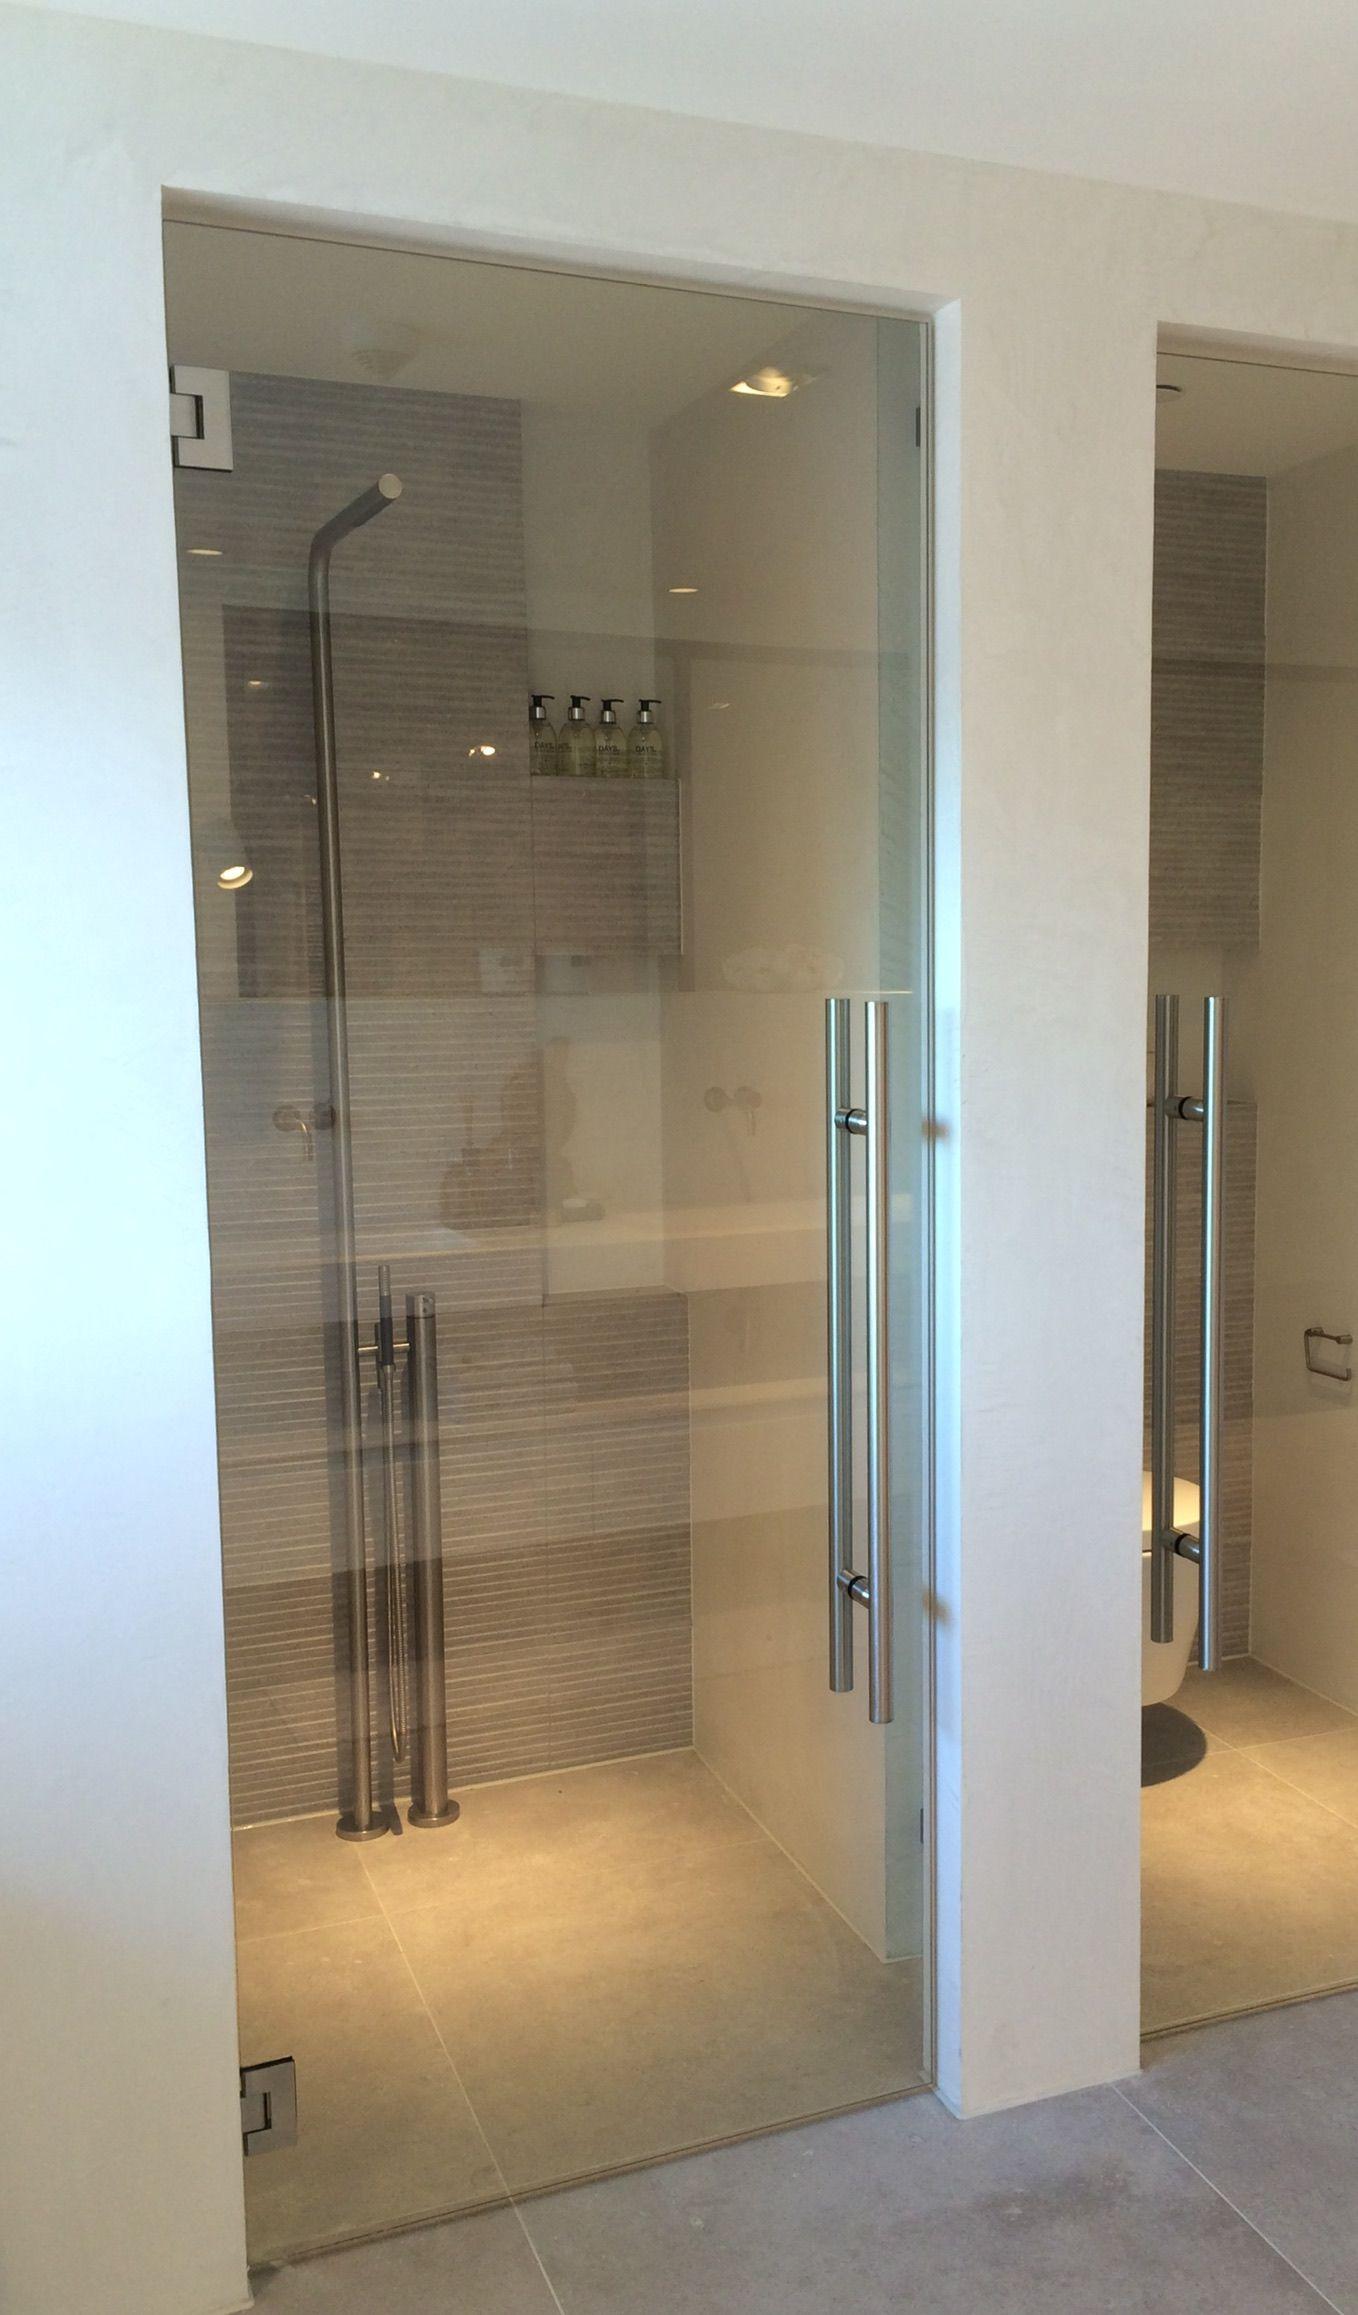 Badkamer douche glazen deur   Bathrooms   Pinterest